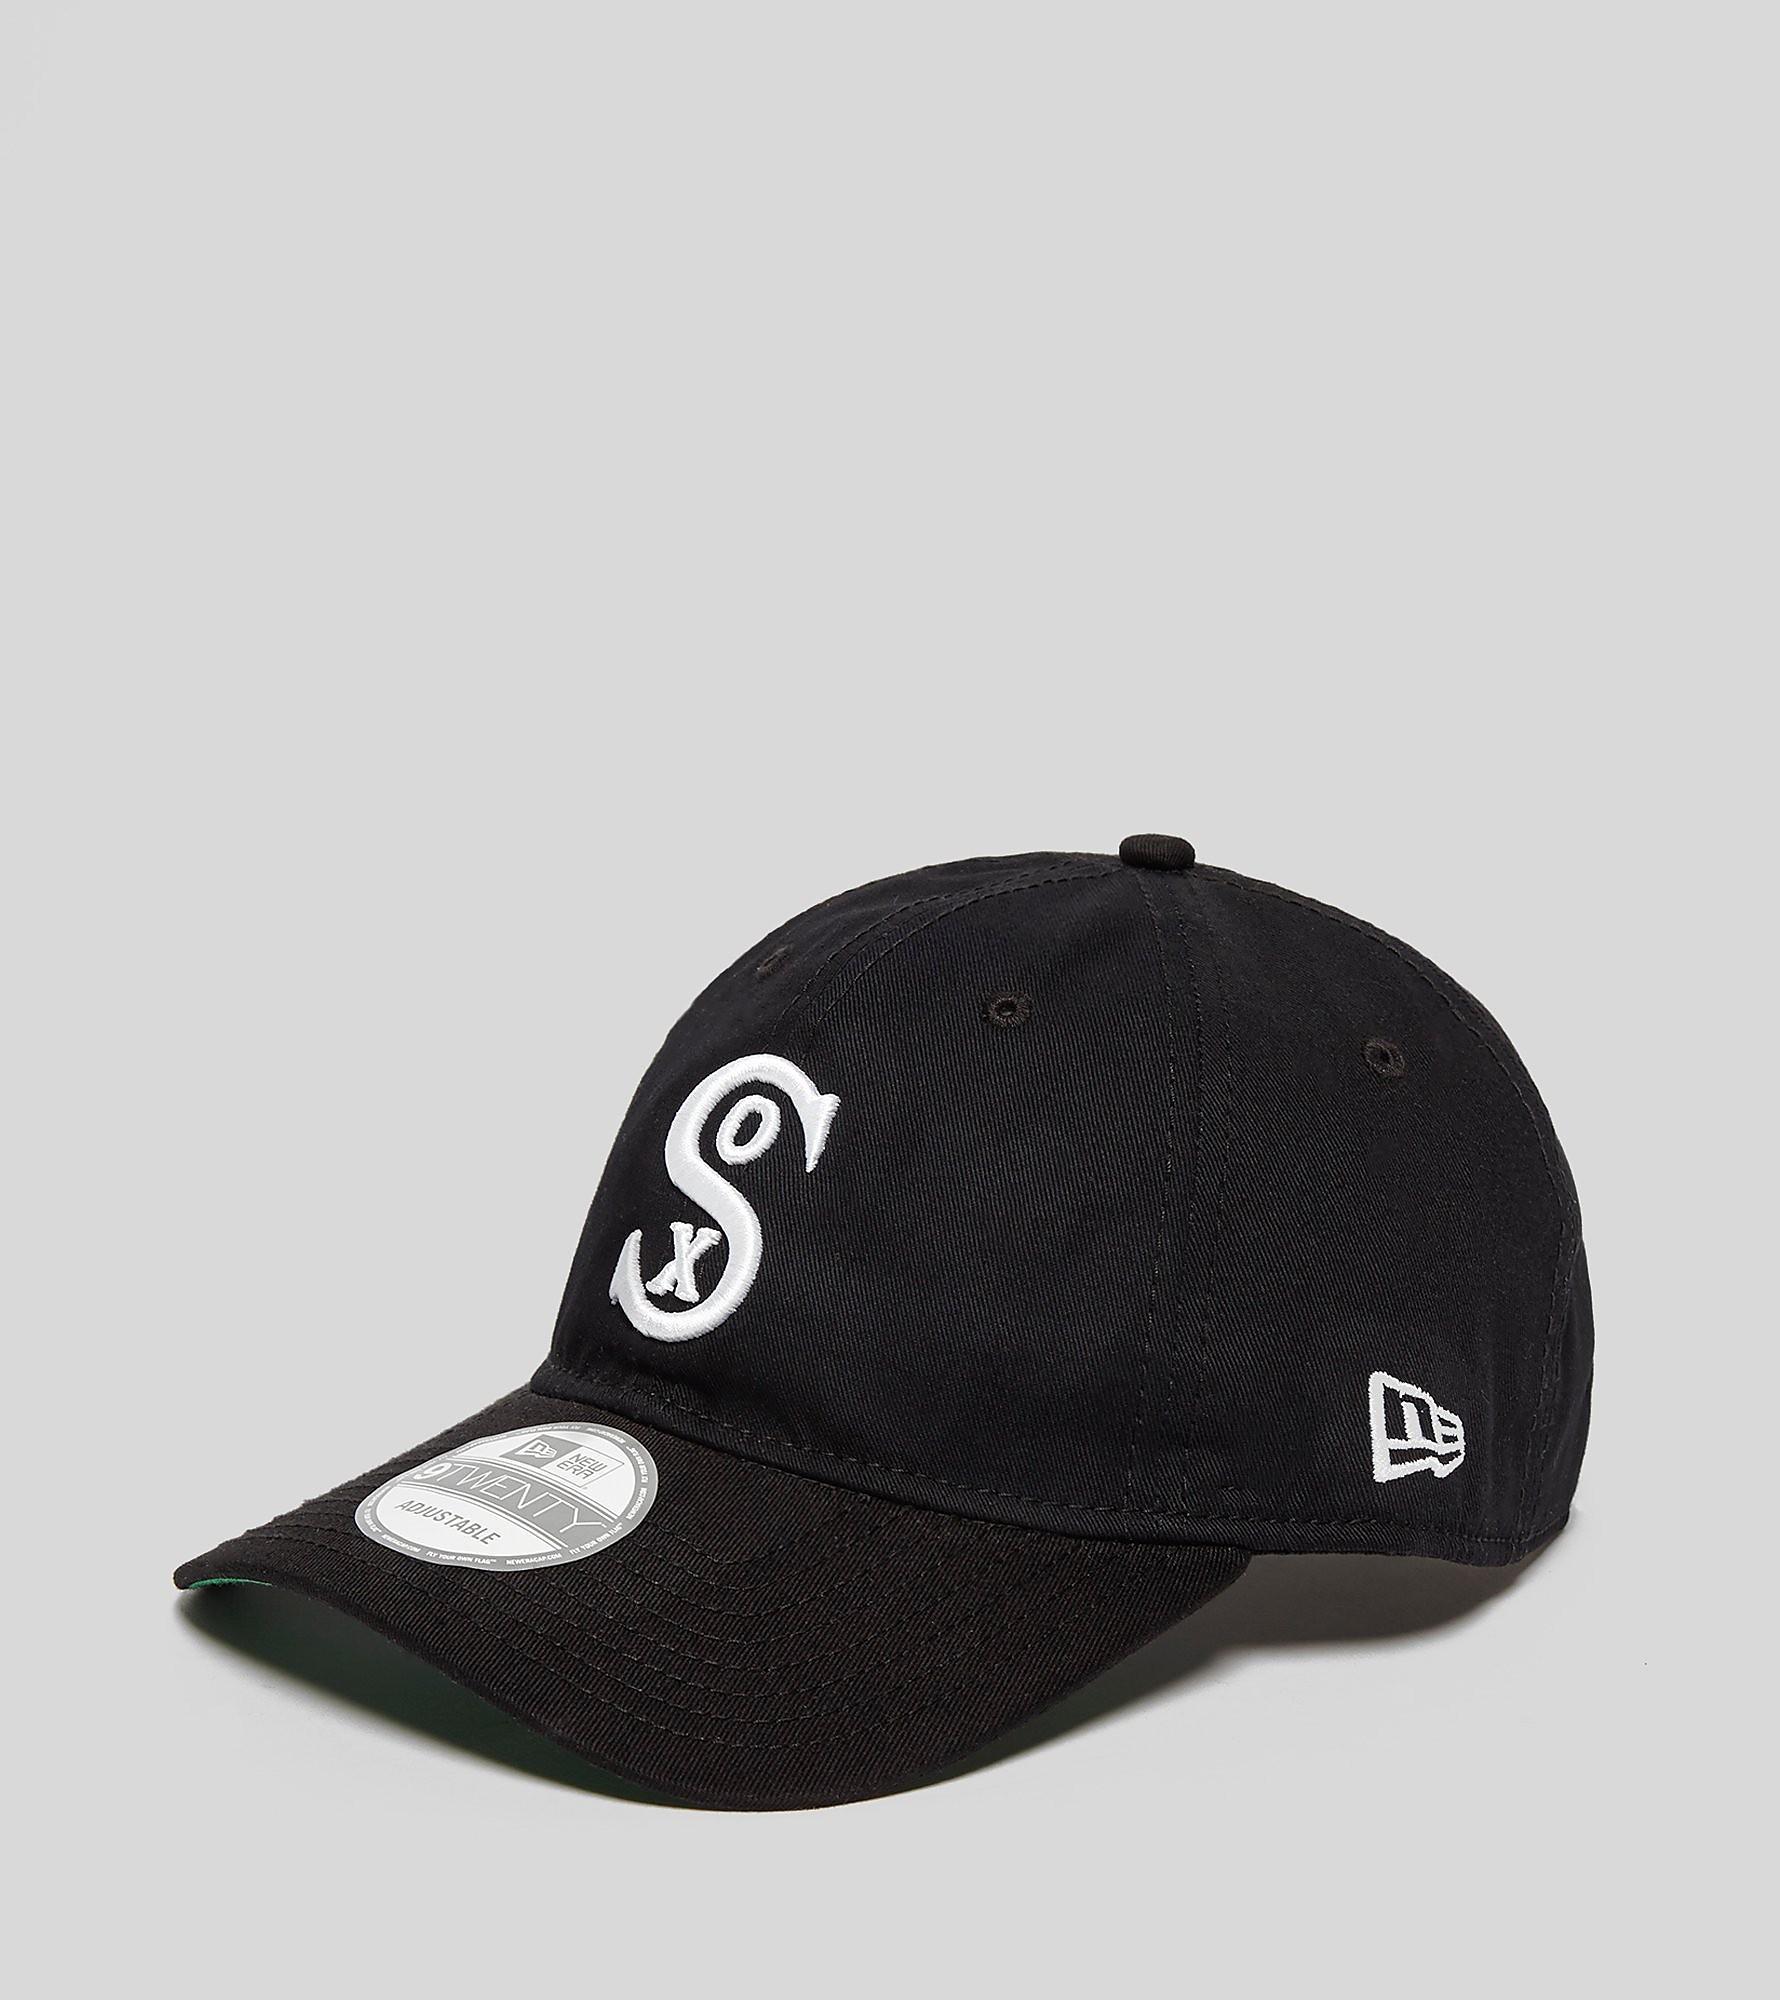 New Era 9TWENTY White Sox Strapback Cap